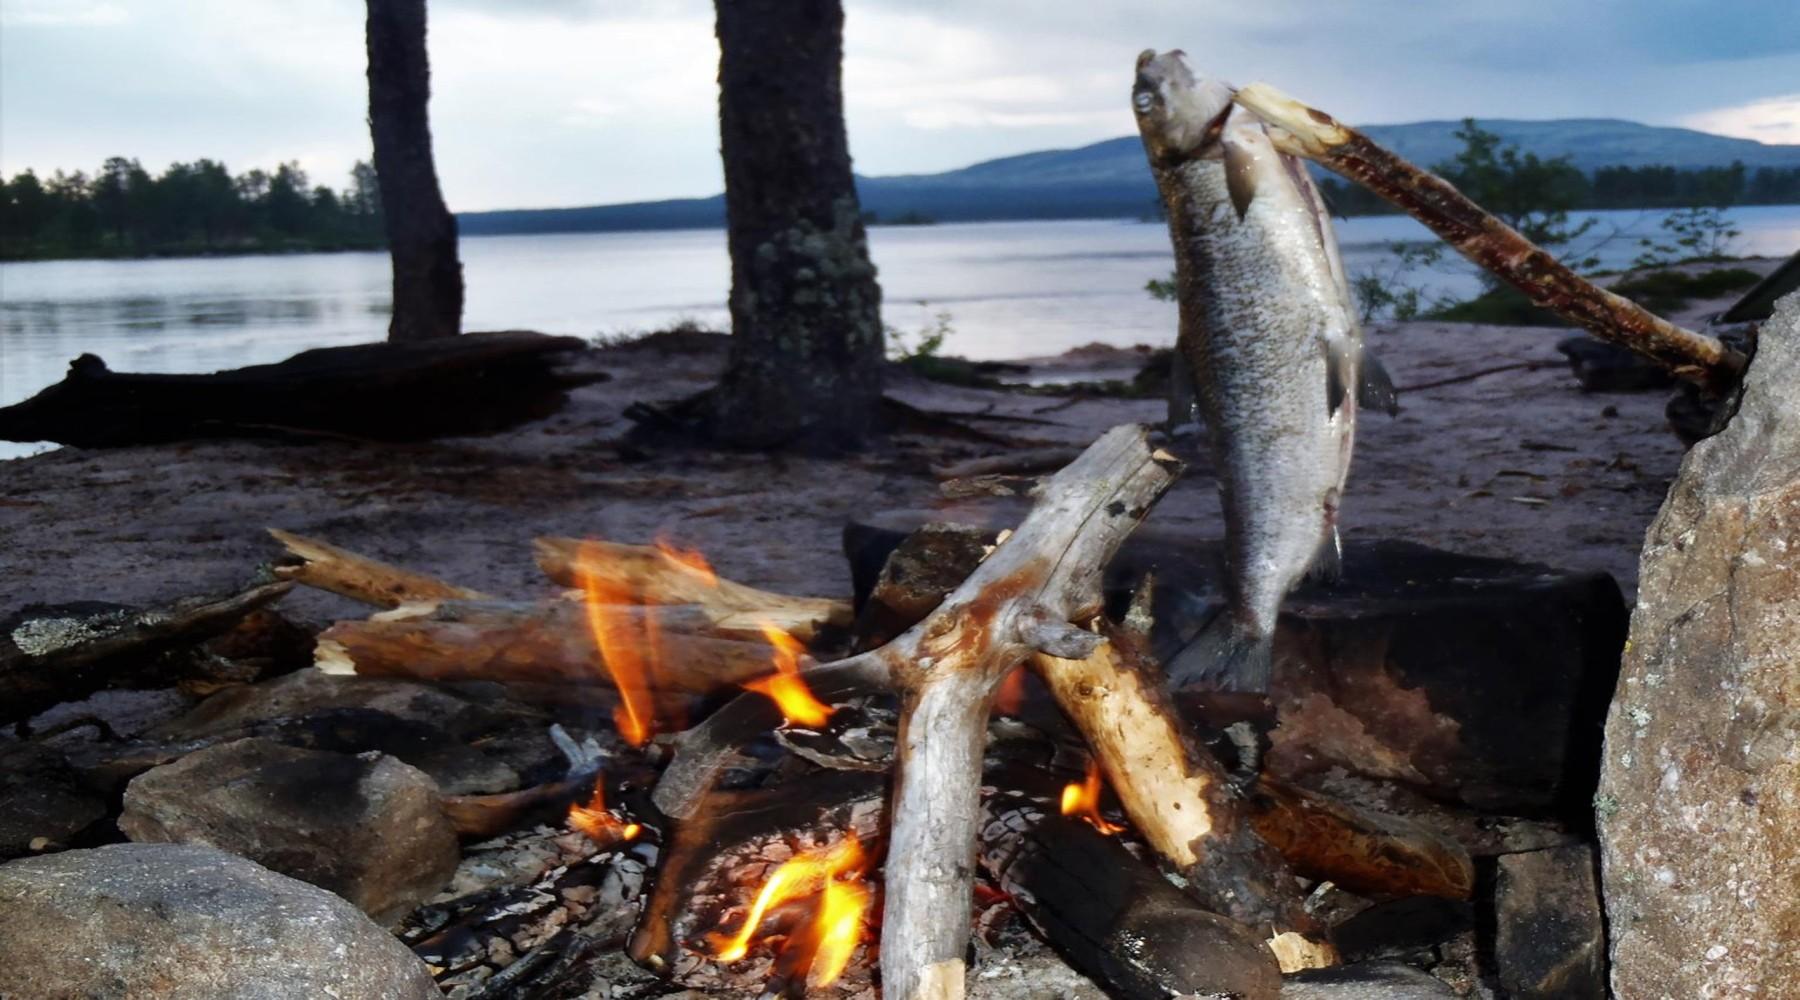 Kanureise: Kanutour in Norwegen (Bild)